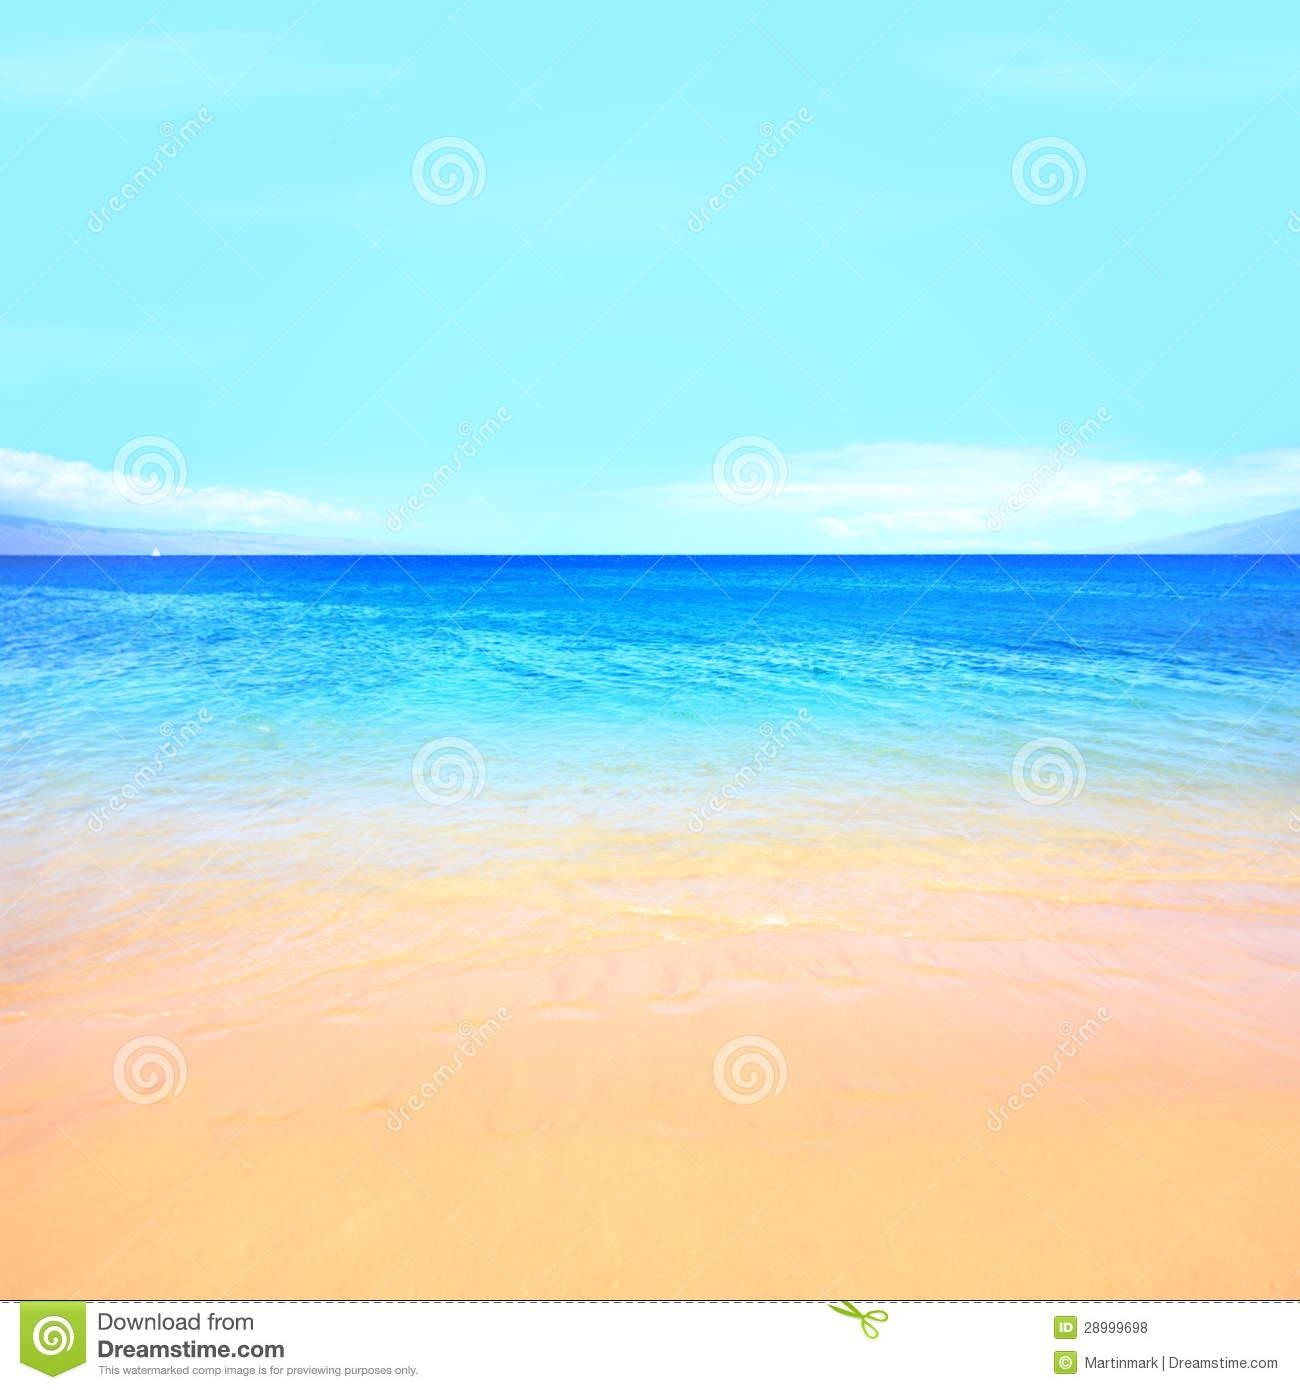 Sandy Beach clipart pirate island Free Fotos Clipground Do Sandy